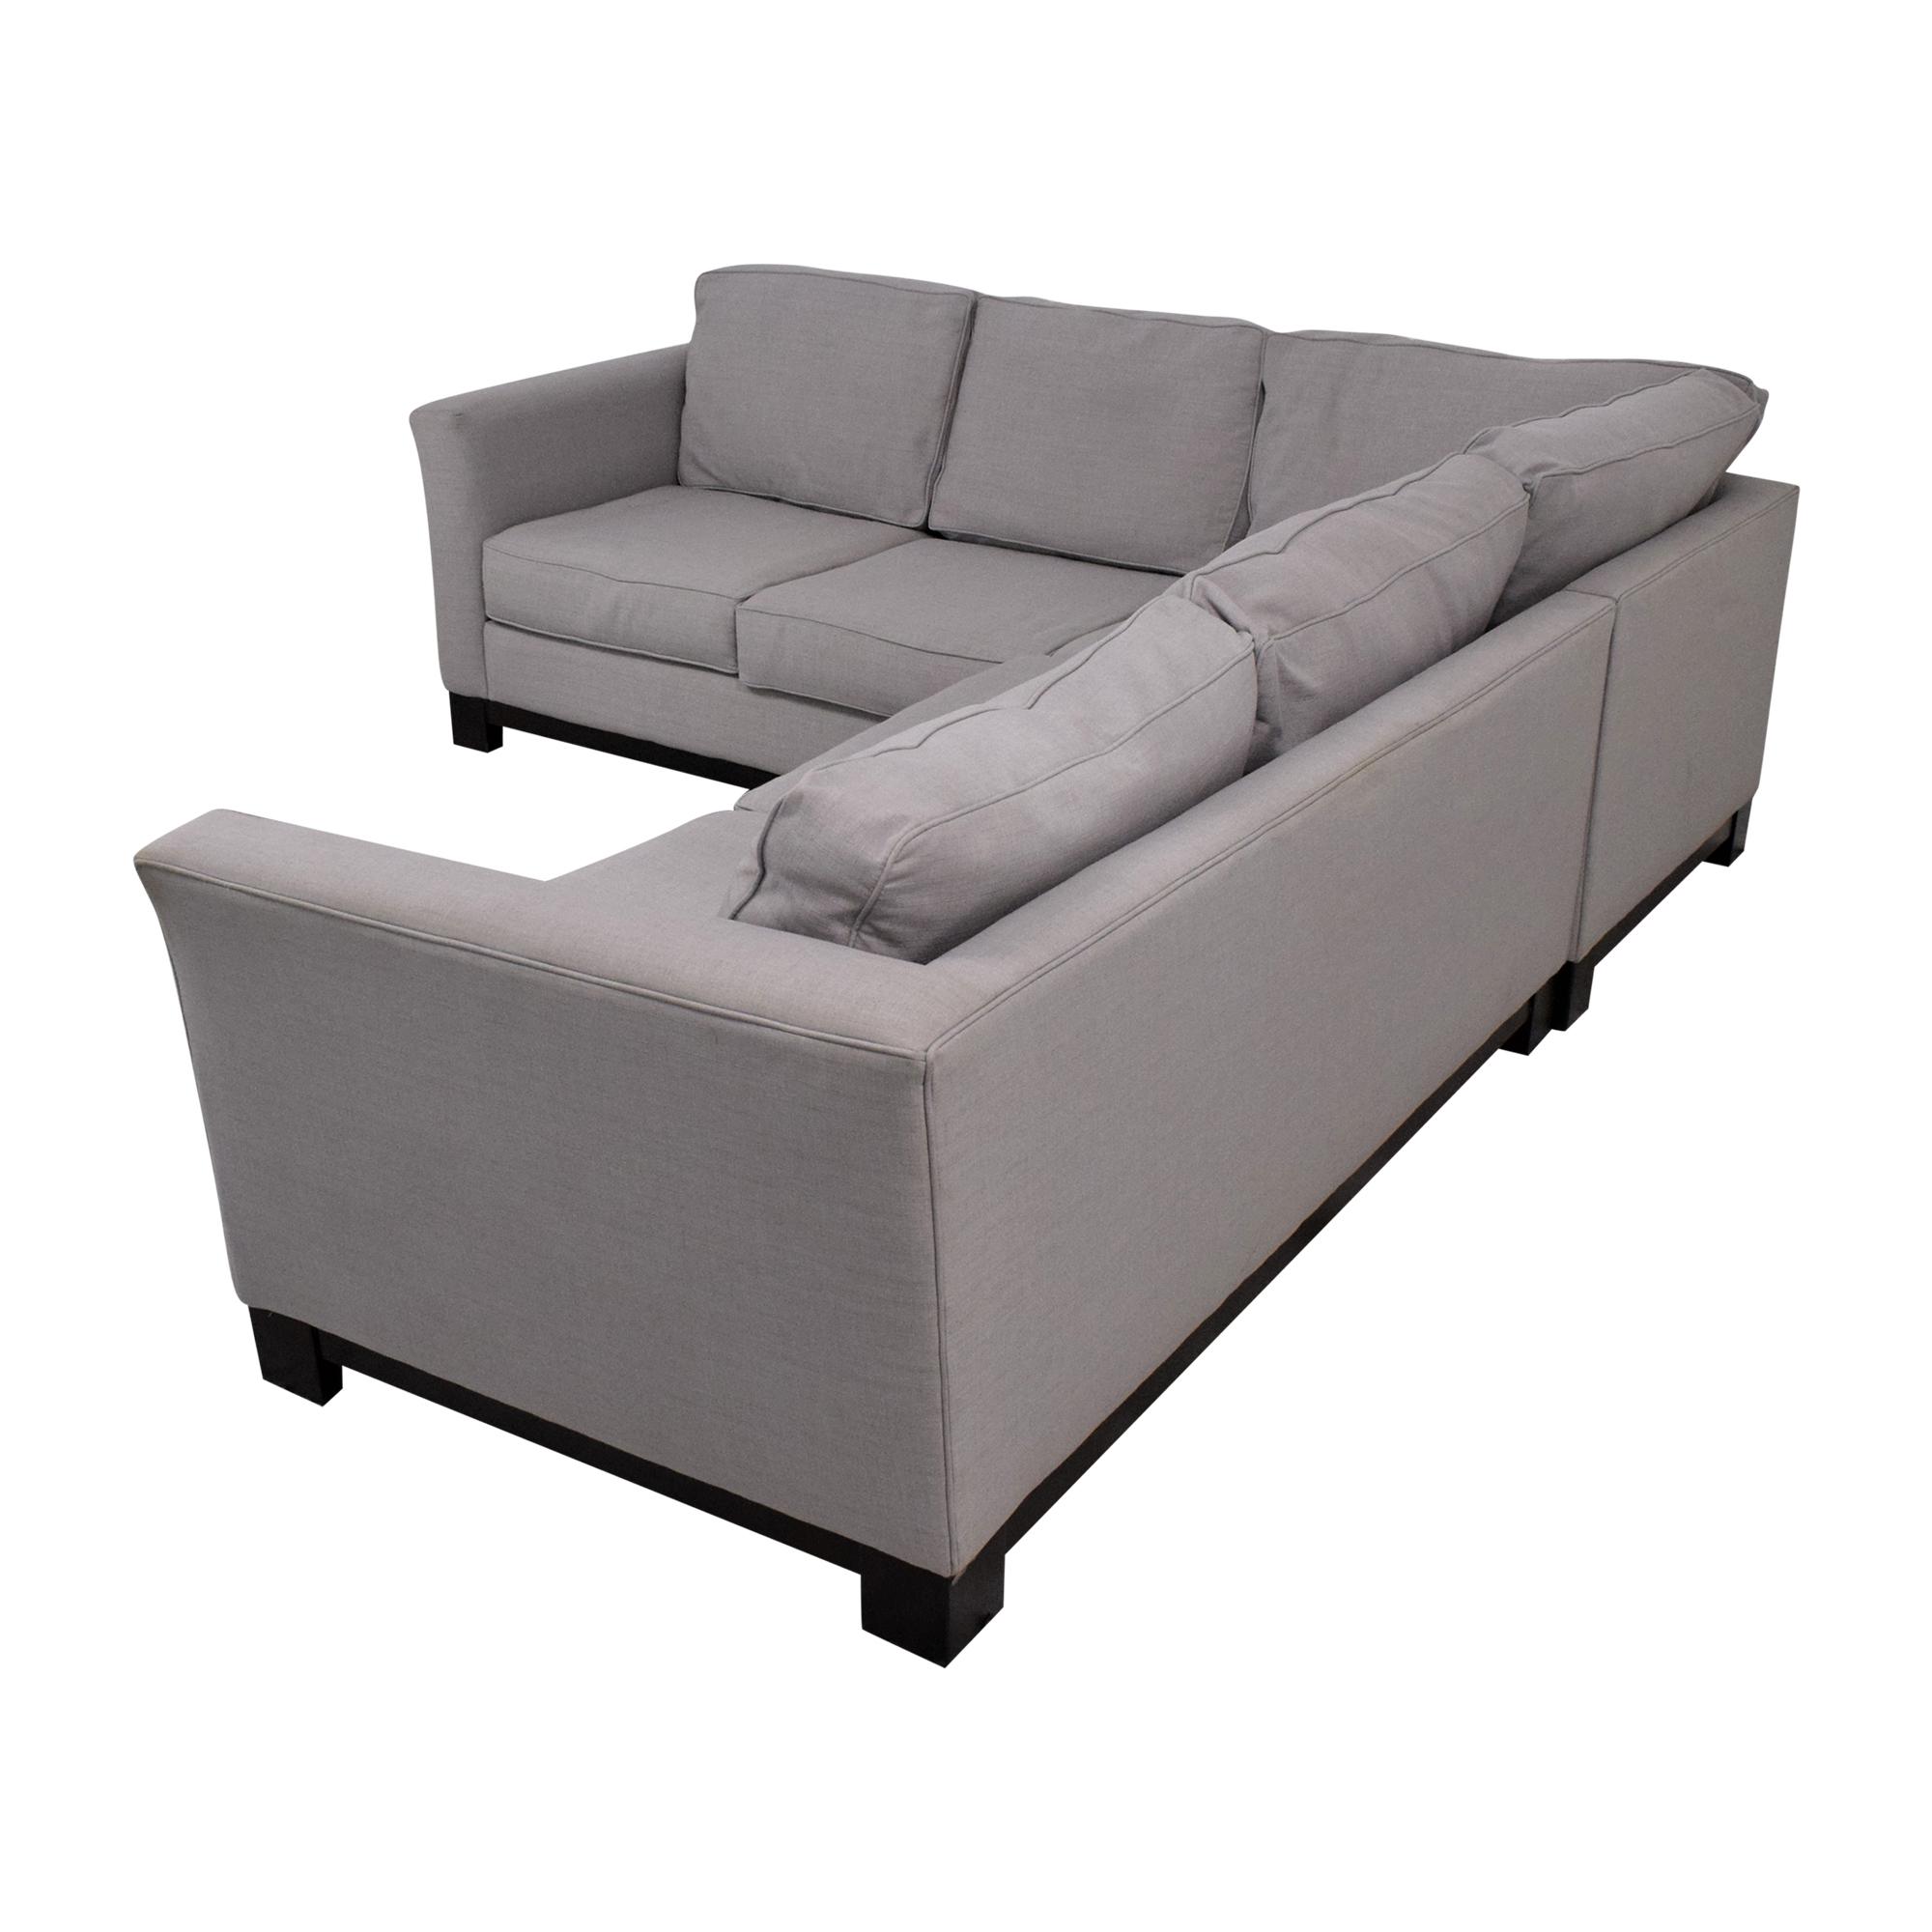 Macy's Macy's Elliot 2pc Sleeper Sofa Sectional dimensions